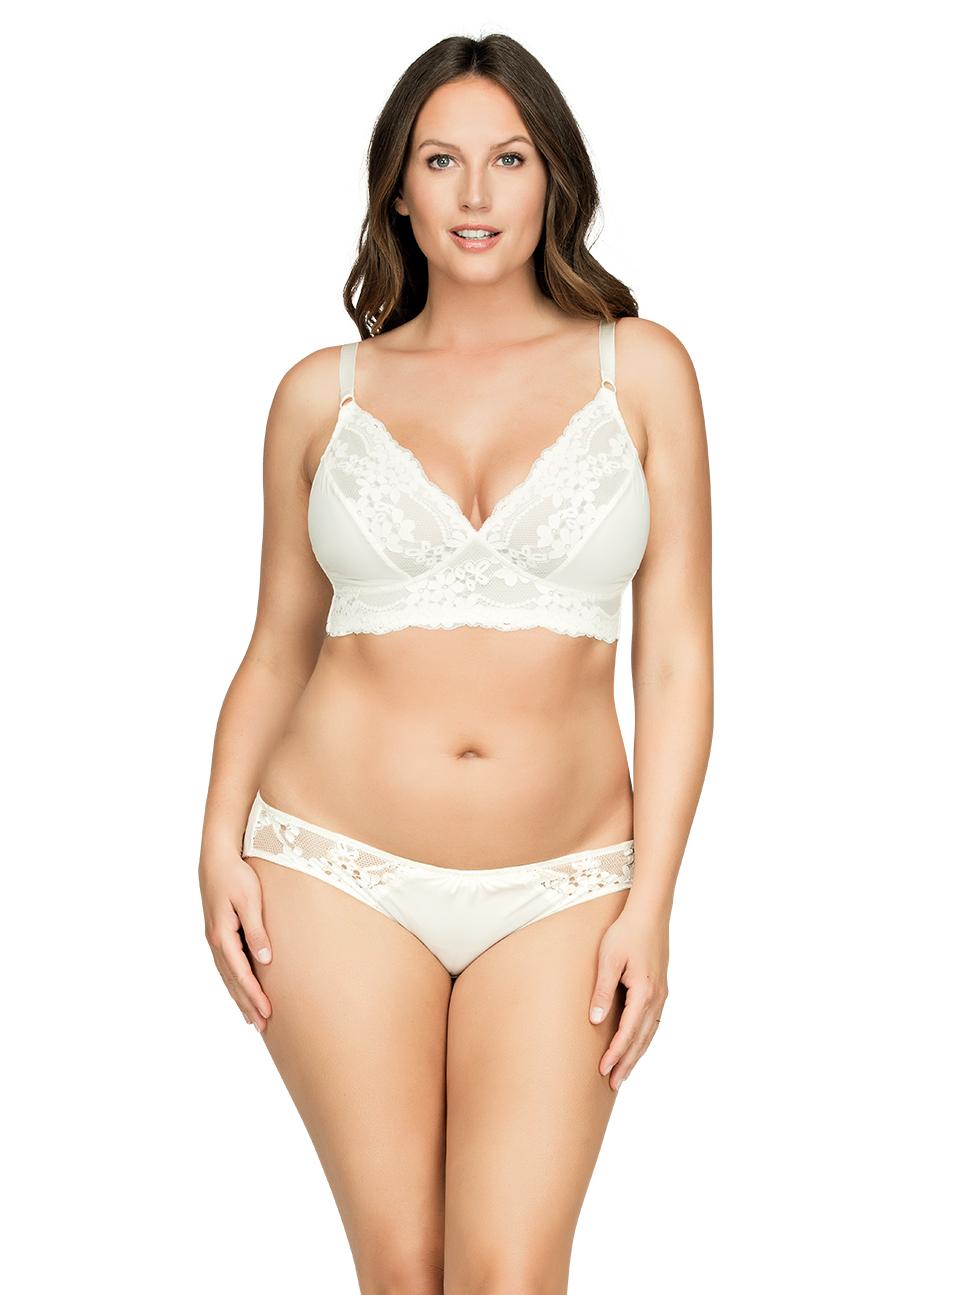 PARFAIT Ciara BraletteP5711 BikiniP5713 Ivory Front1 - Ciara Bralette Ivory P5711